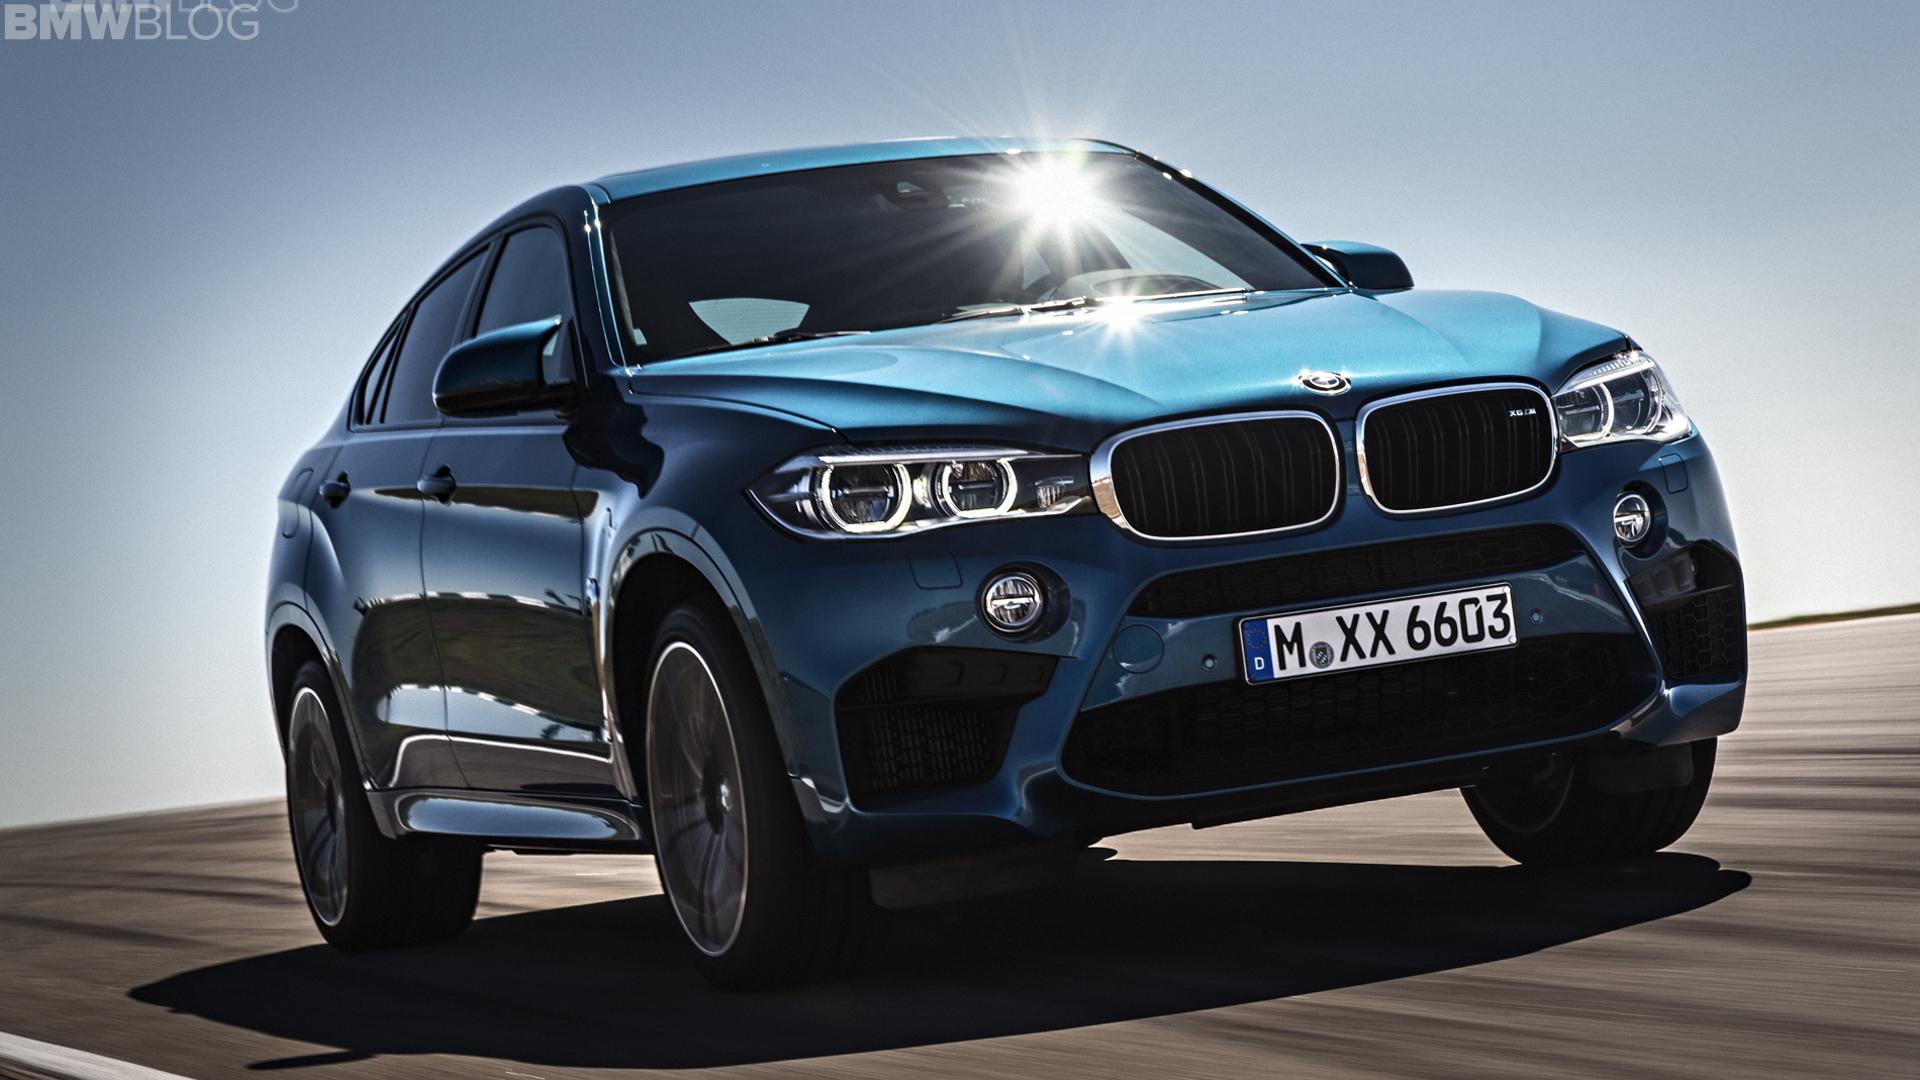 BMW X6 M Comparison 10 of 12